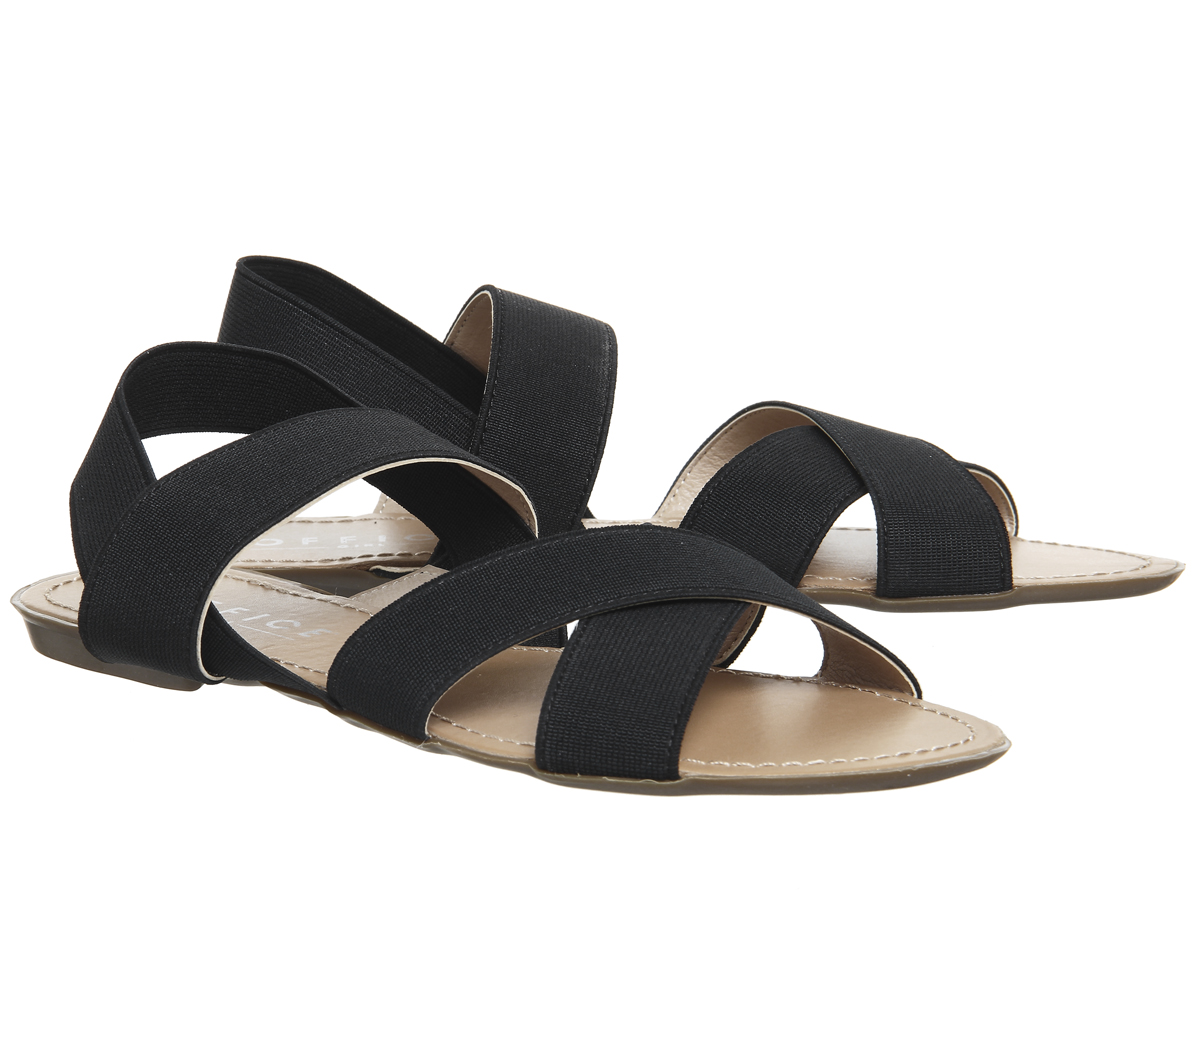 d408c703873e Womens Office Skippy Elastic Cross Strap Sandals Black Sandals